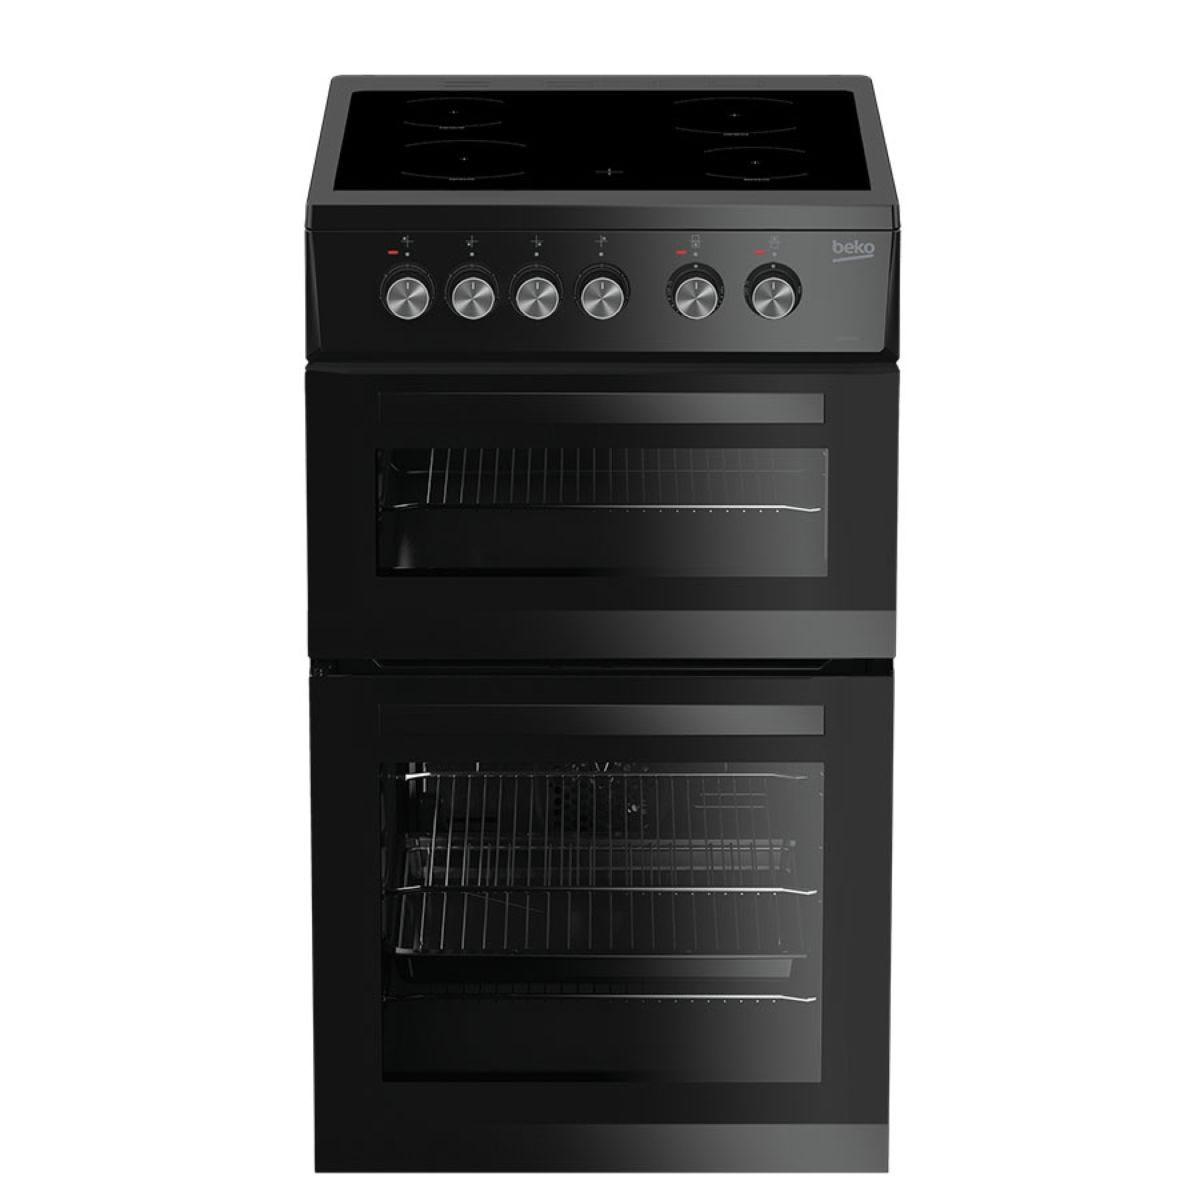 Beko KDVC563AK Double Oven Electric Cooker - Black